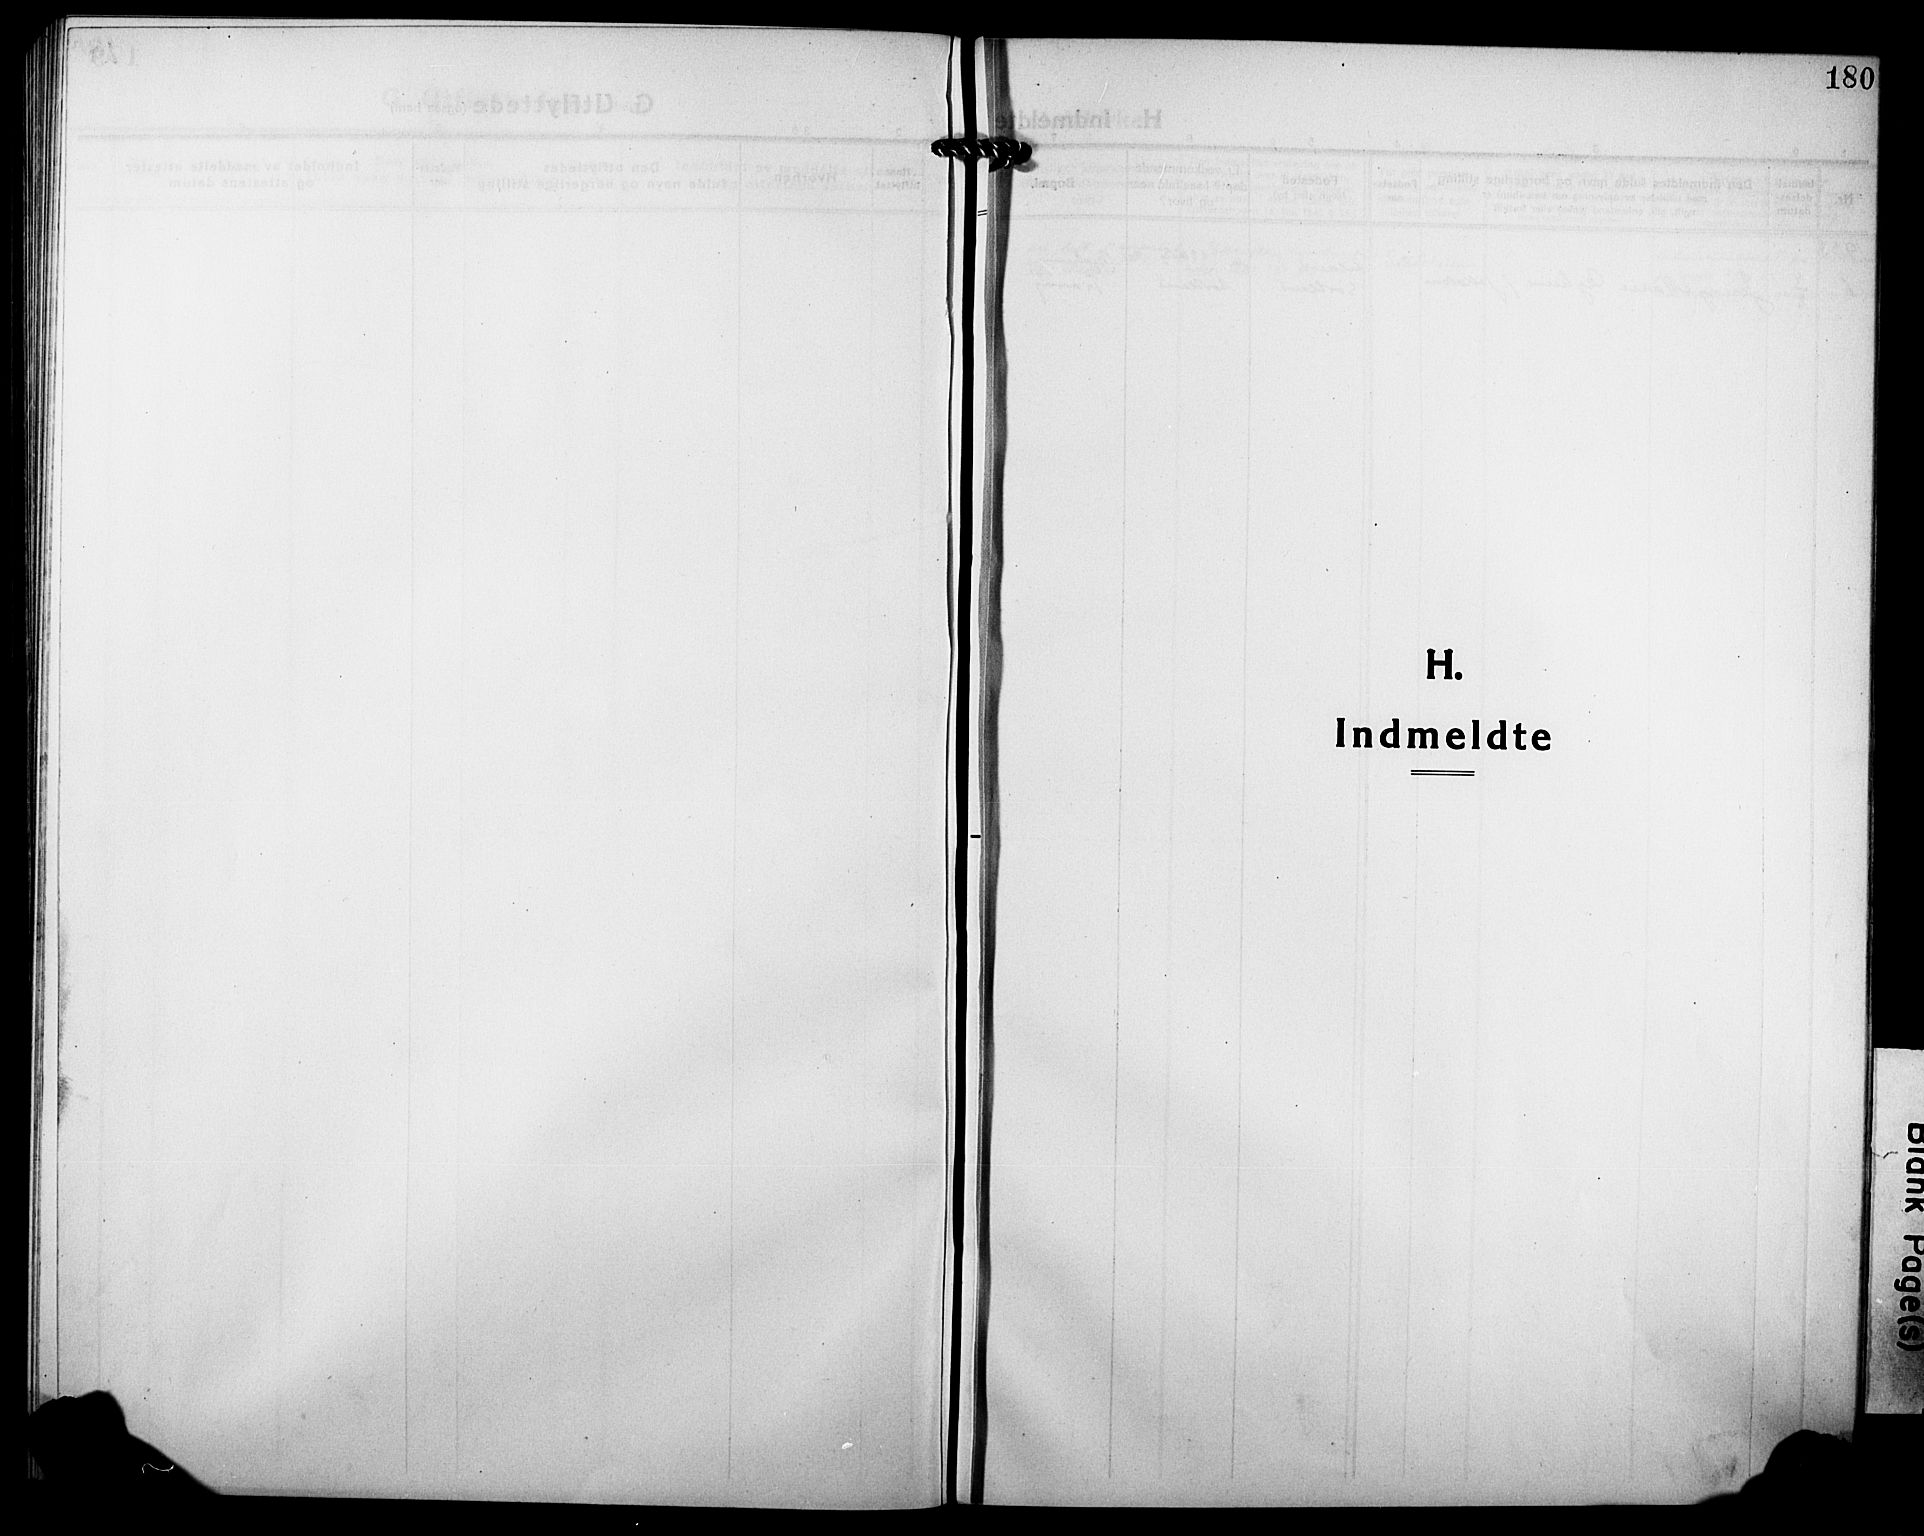 SATØ, Tranøy sokneprestkontor, I/Ia/Iab/L0006klokker: Klokkerbok nr. 6, 1919-1932, s. 180